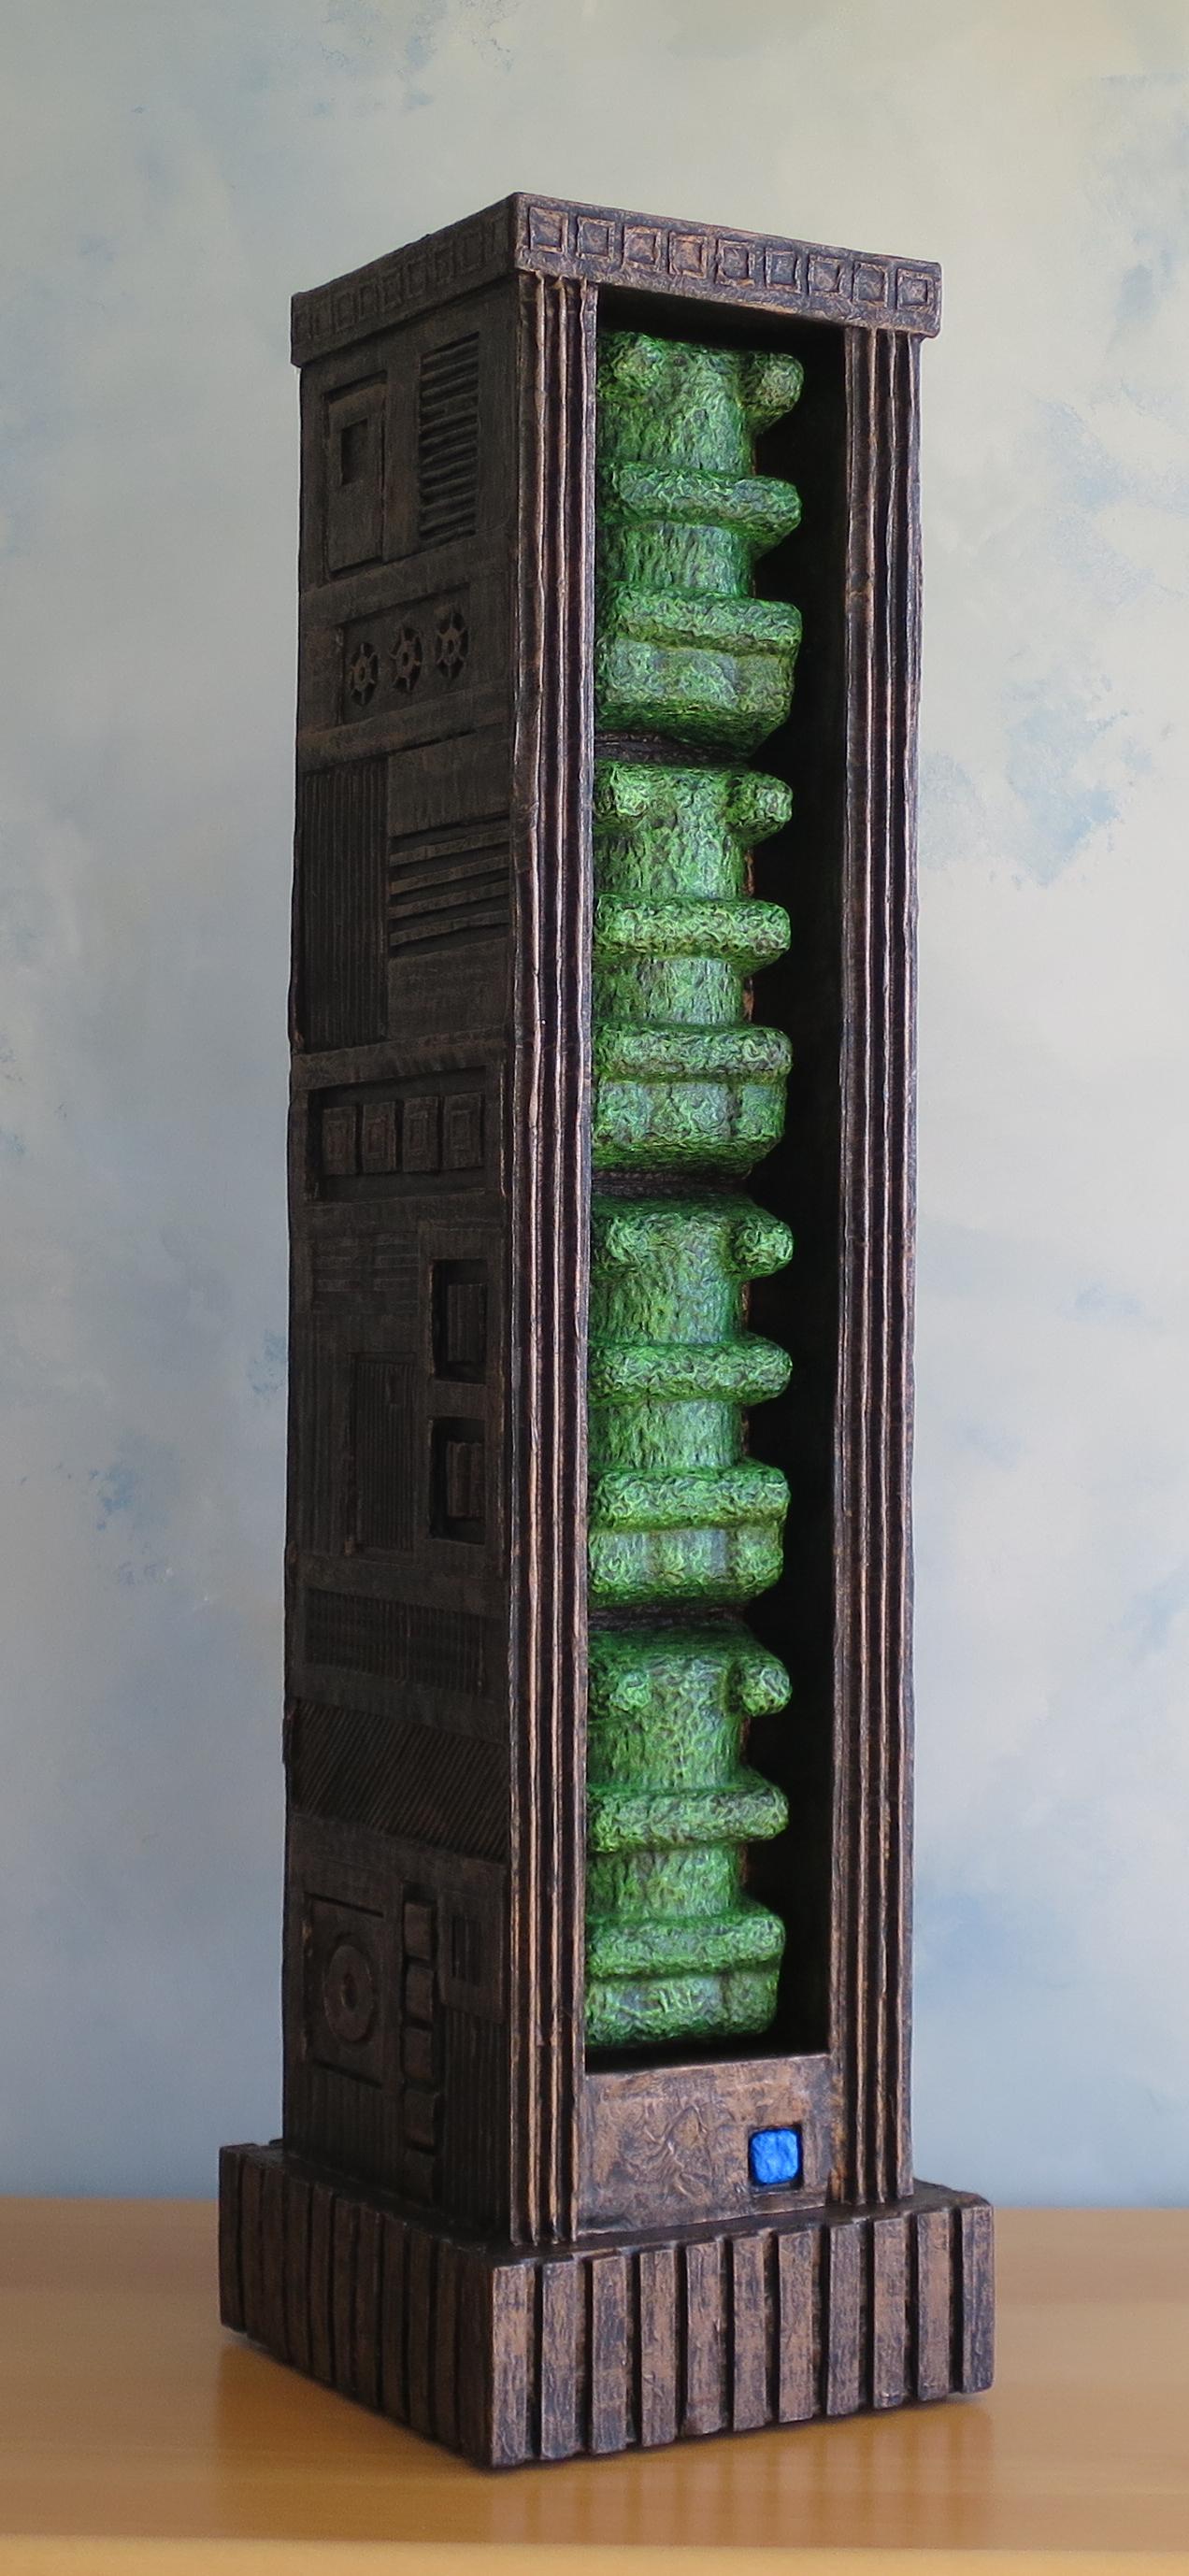 "Stela No.2, 30.5x7x8.5"""